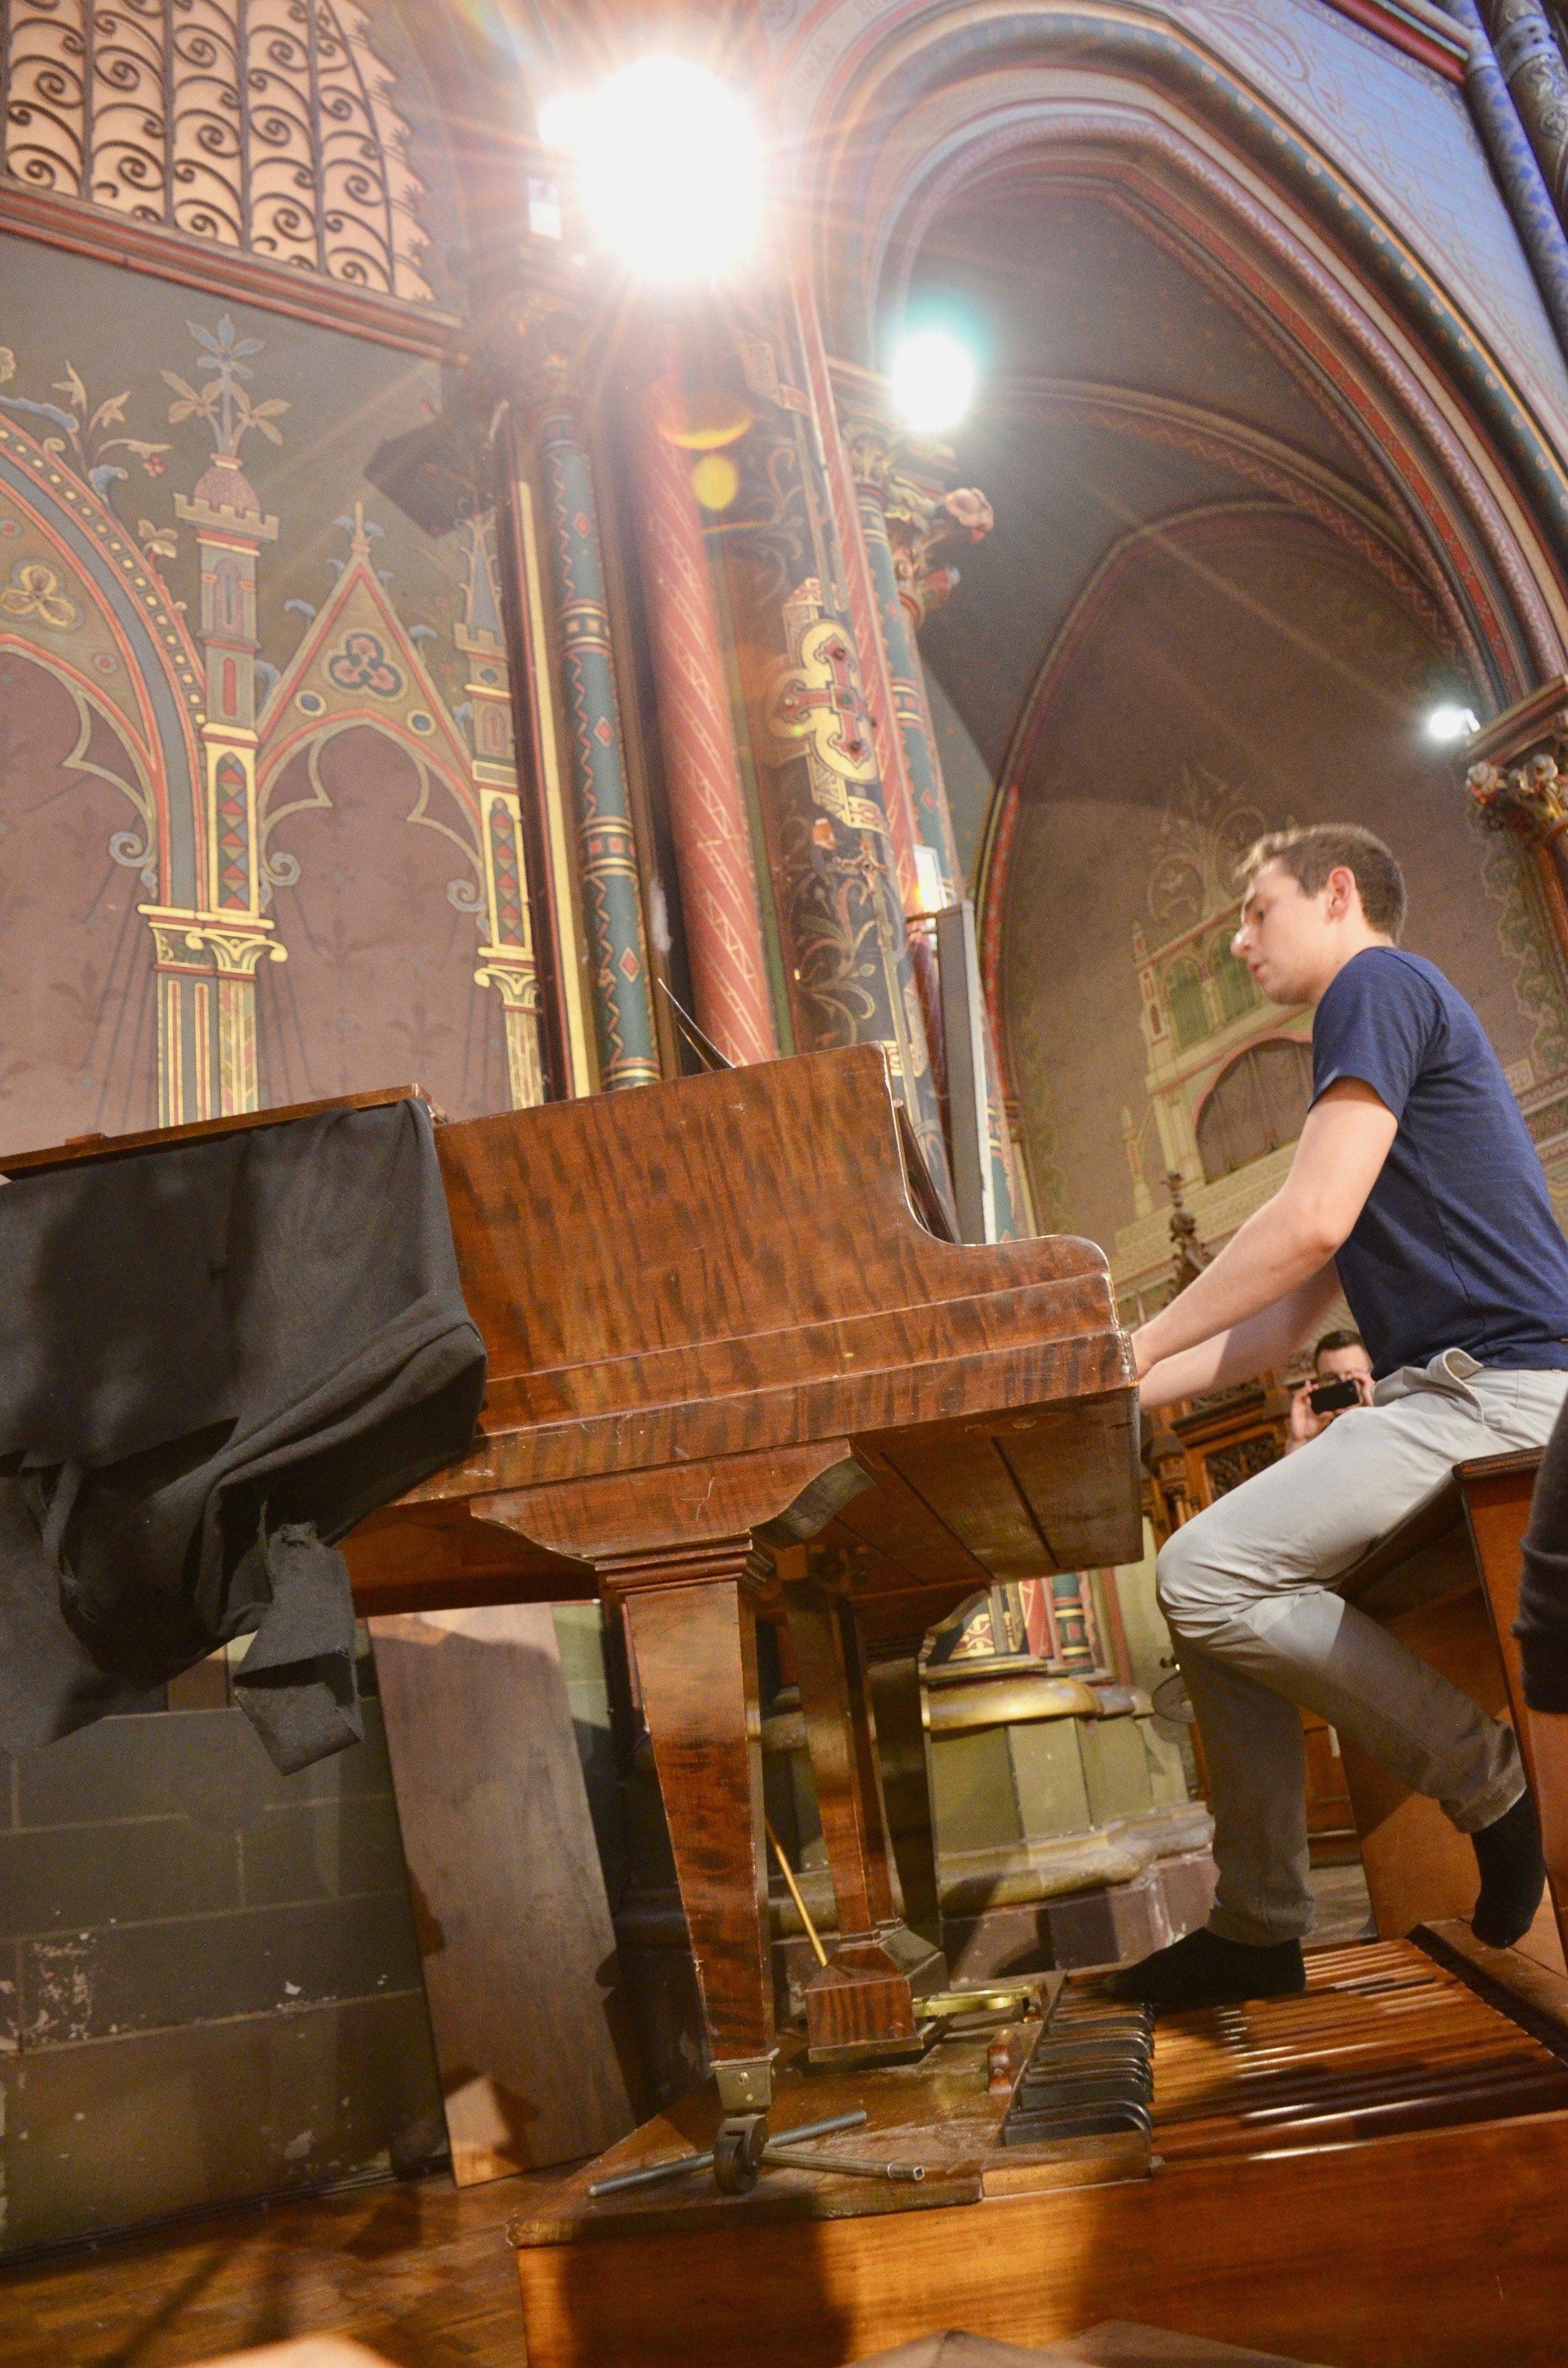 David von Behren performing a pedal-piano work of Schumann in the Gésu Church, Toulouse.